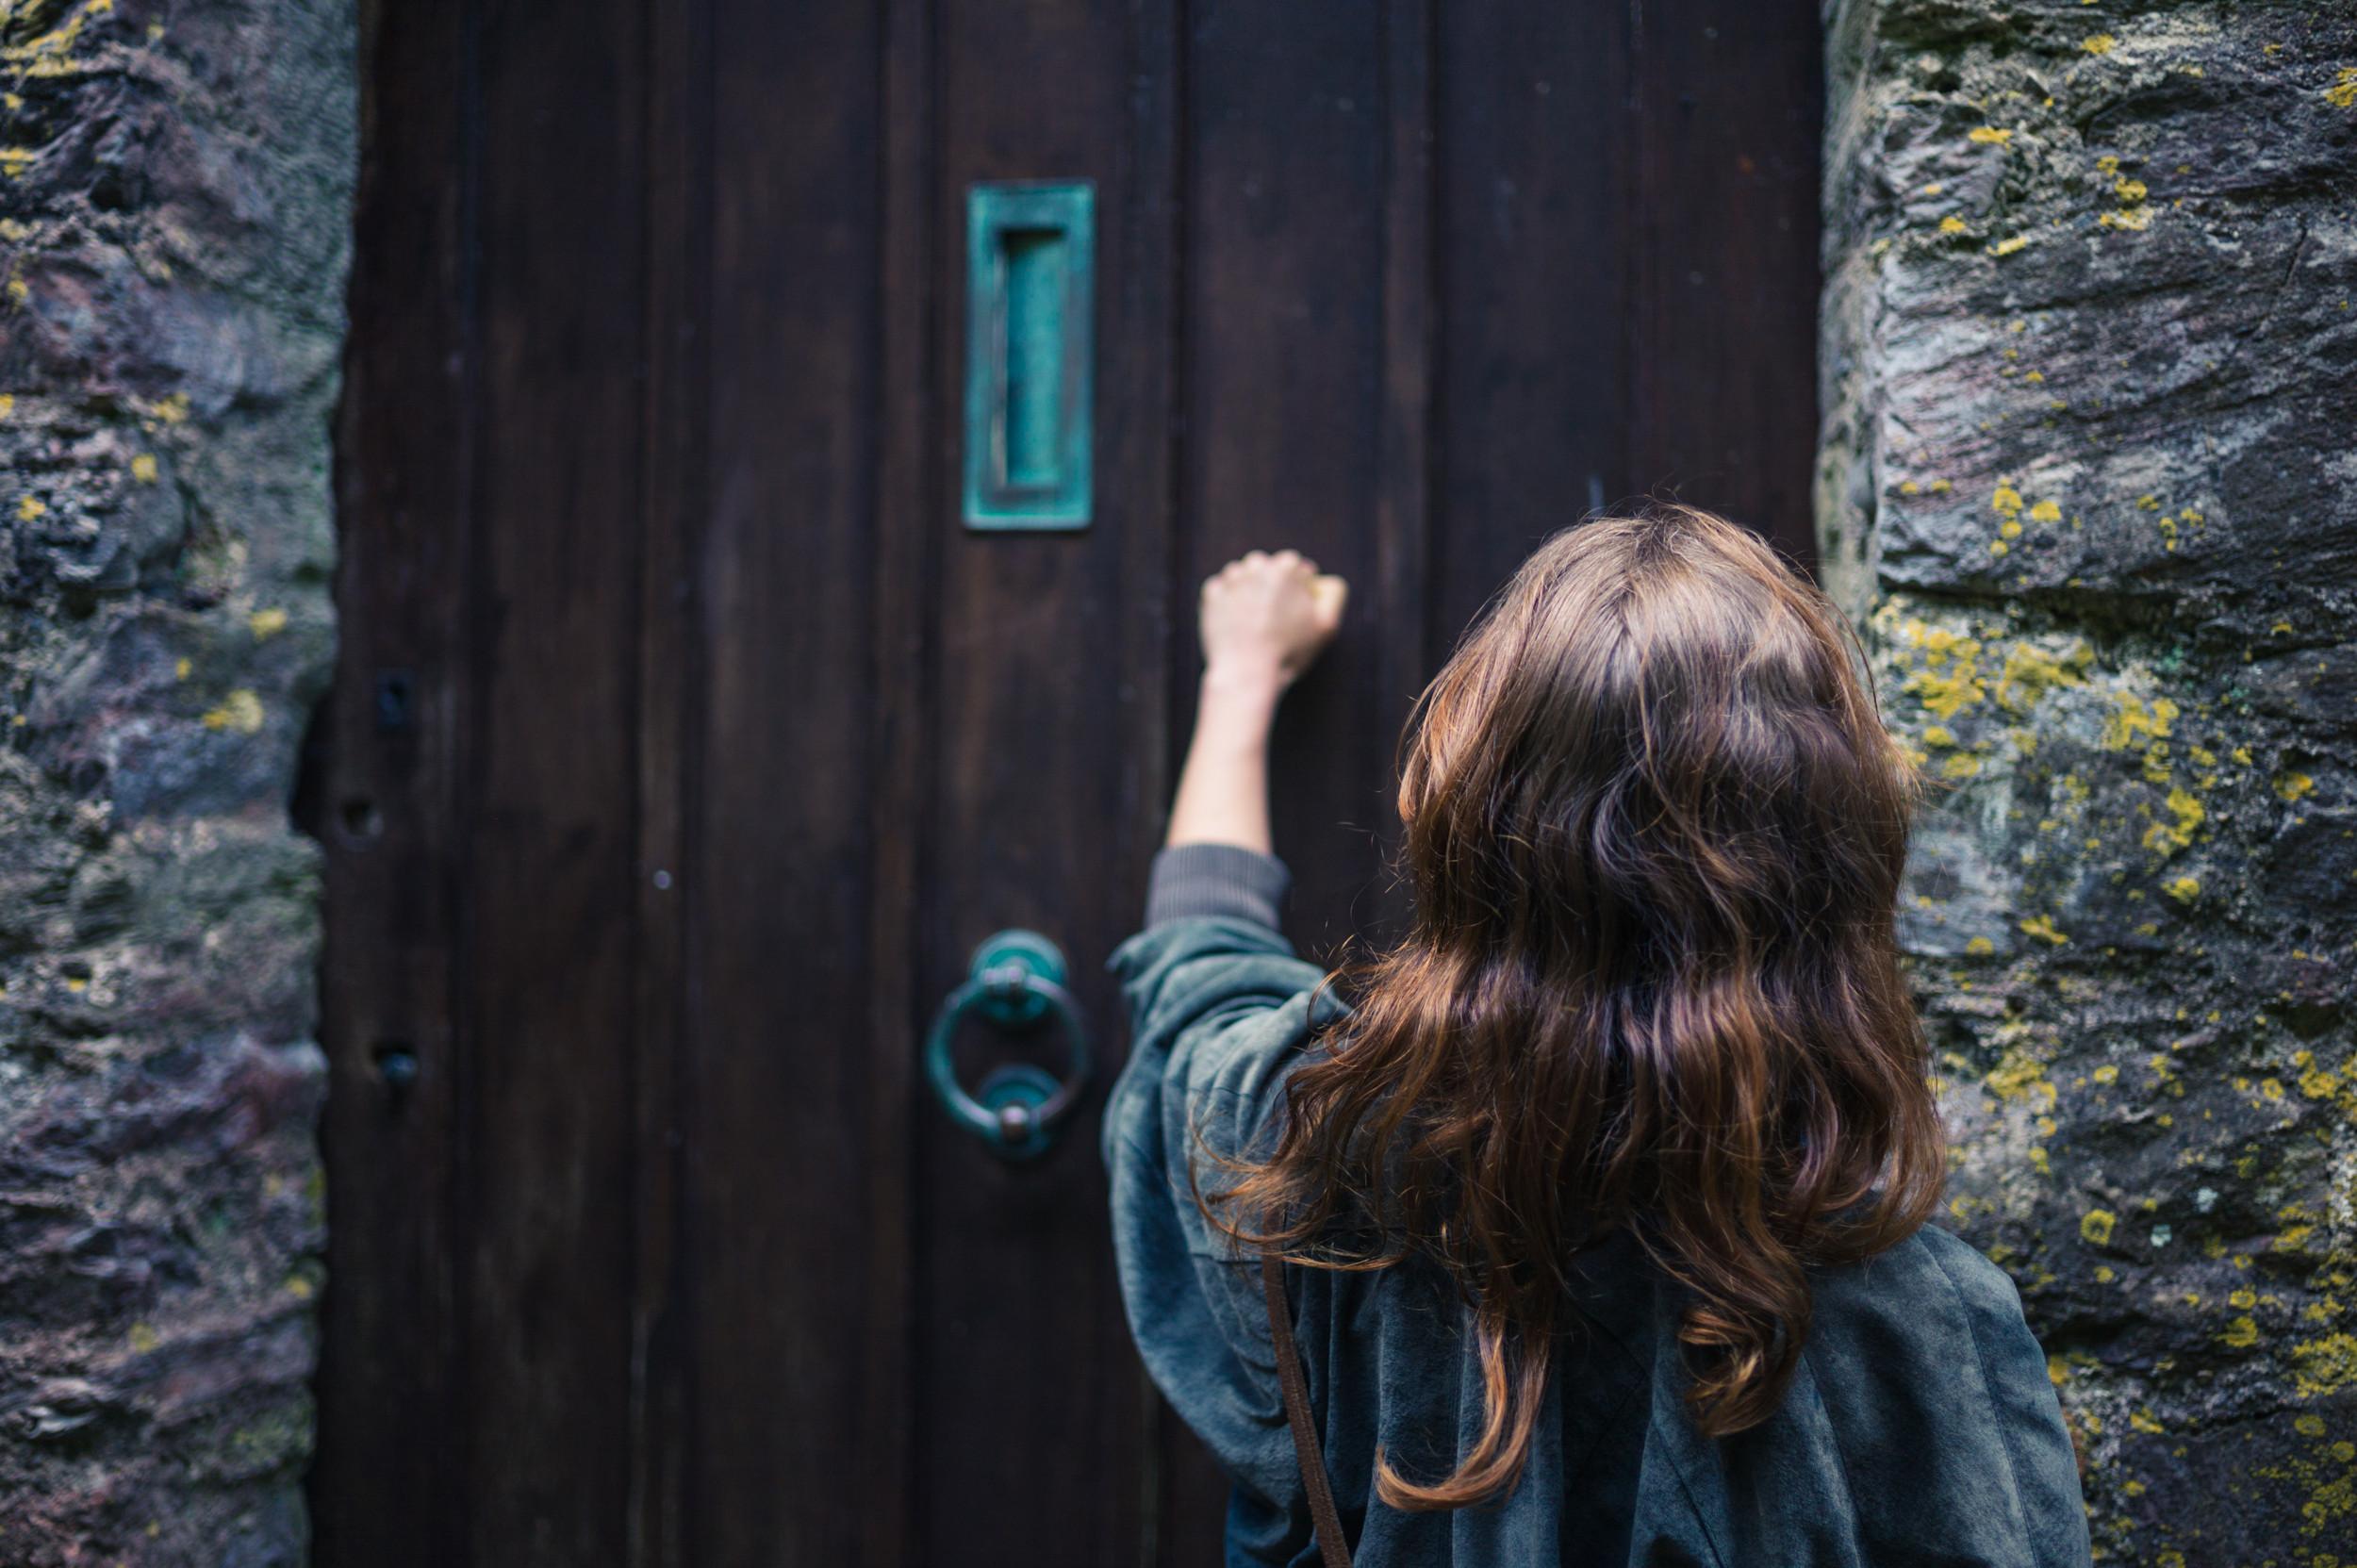 Woman knocking on door